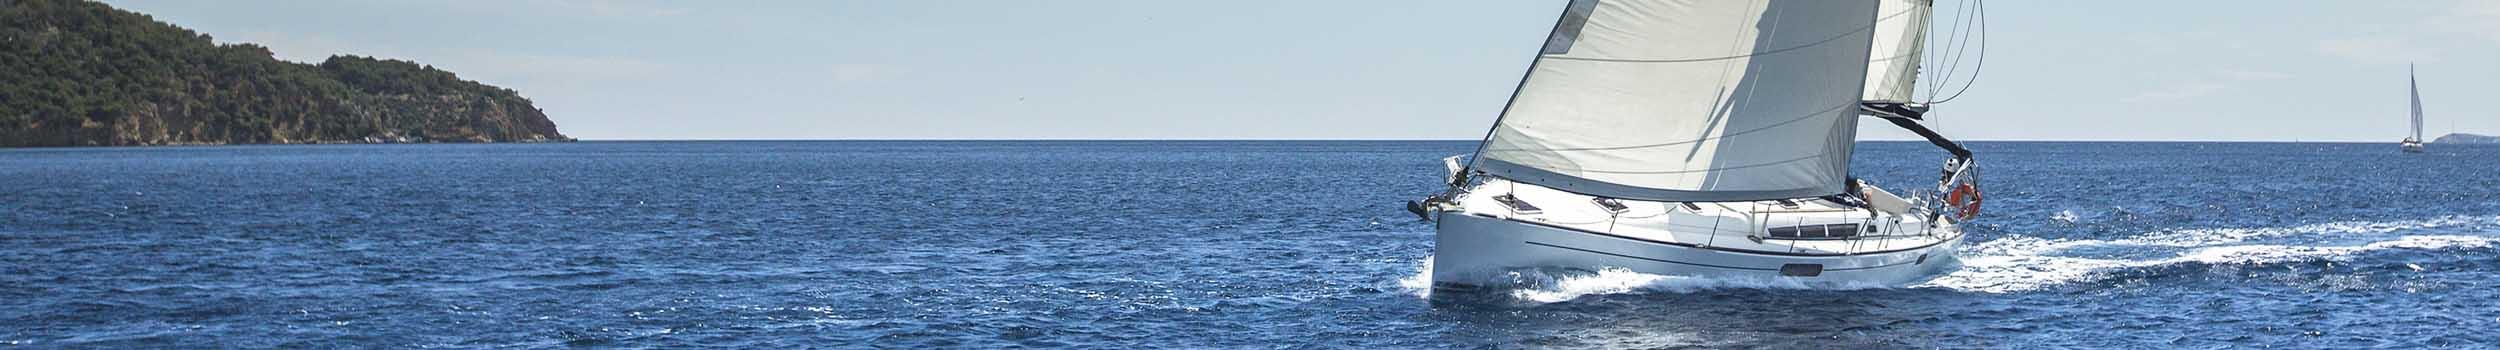 Waypoint - Yacht Charter Croatia - Price List